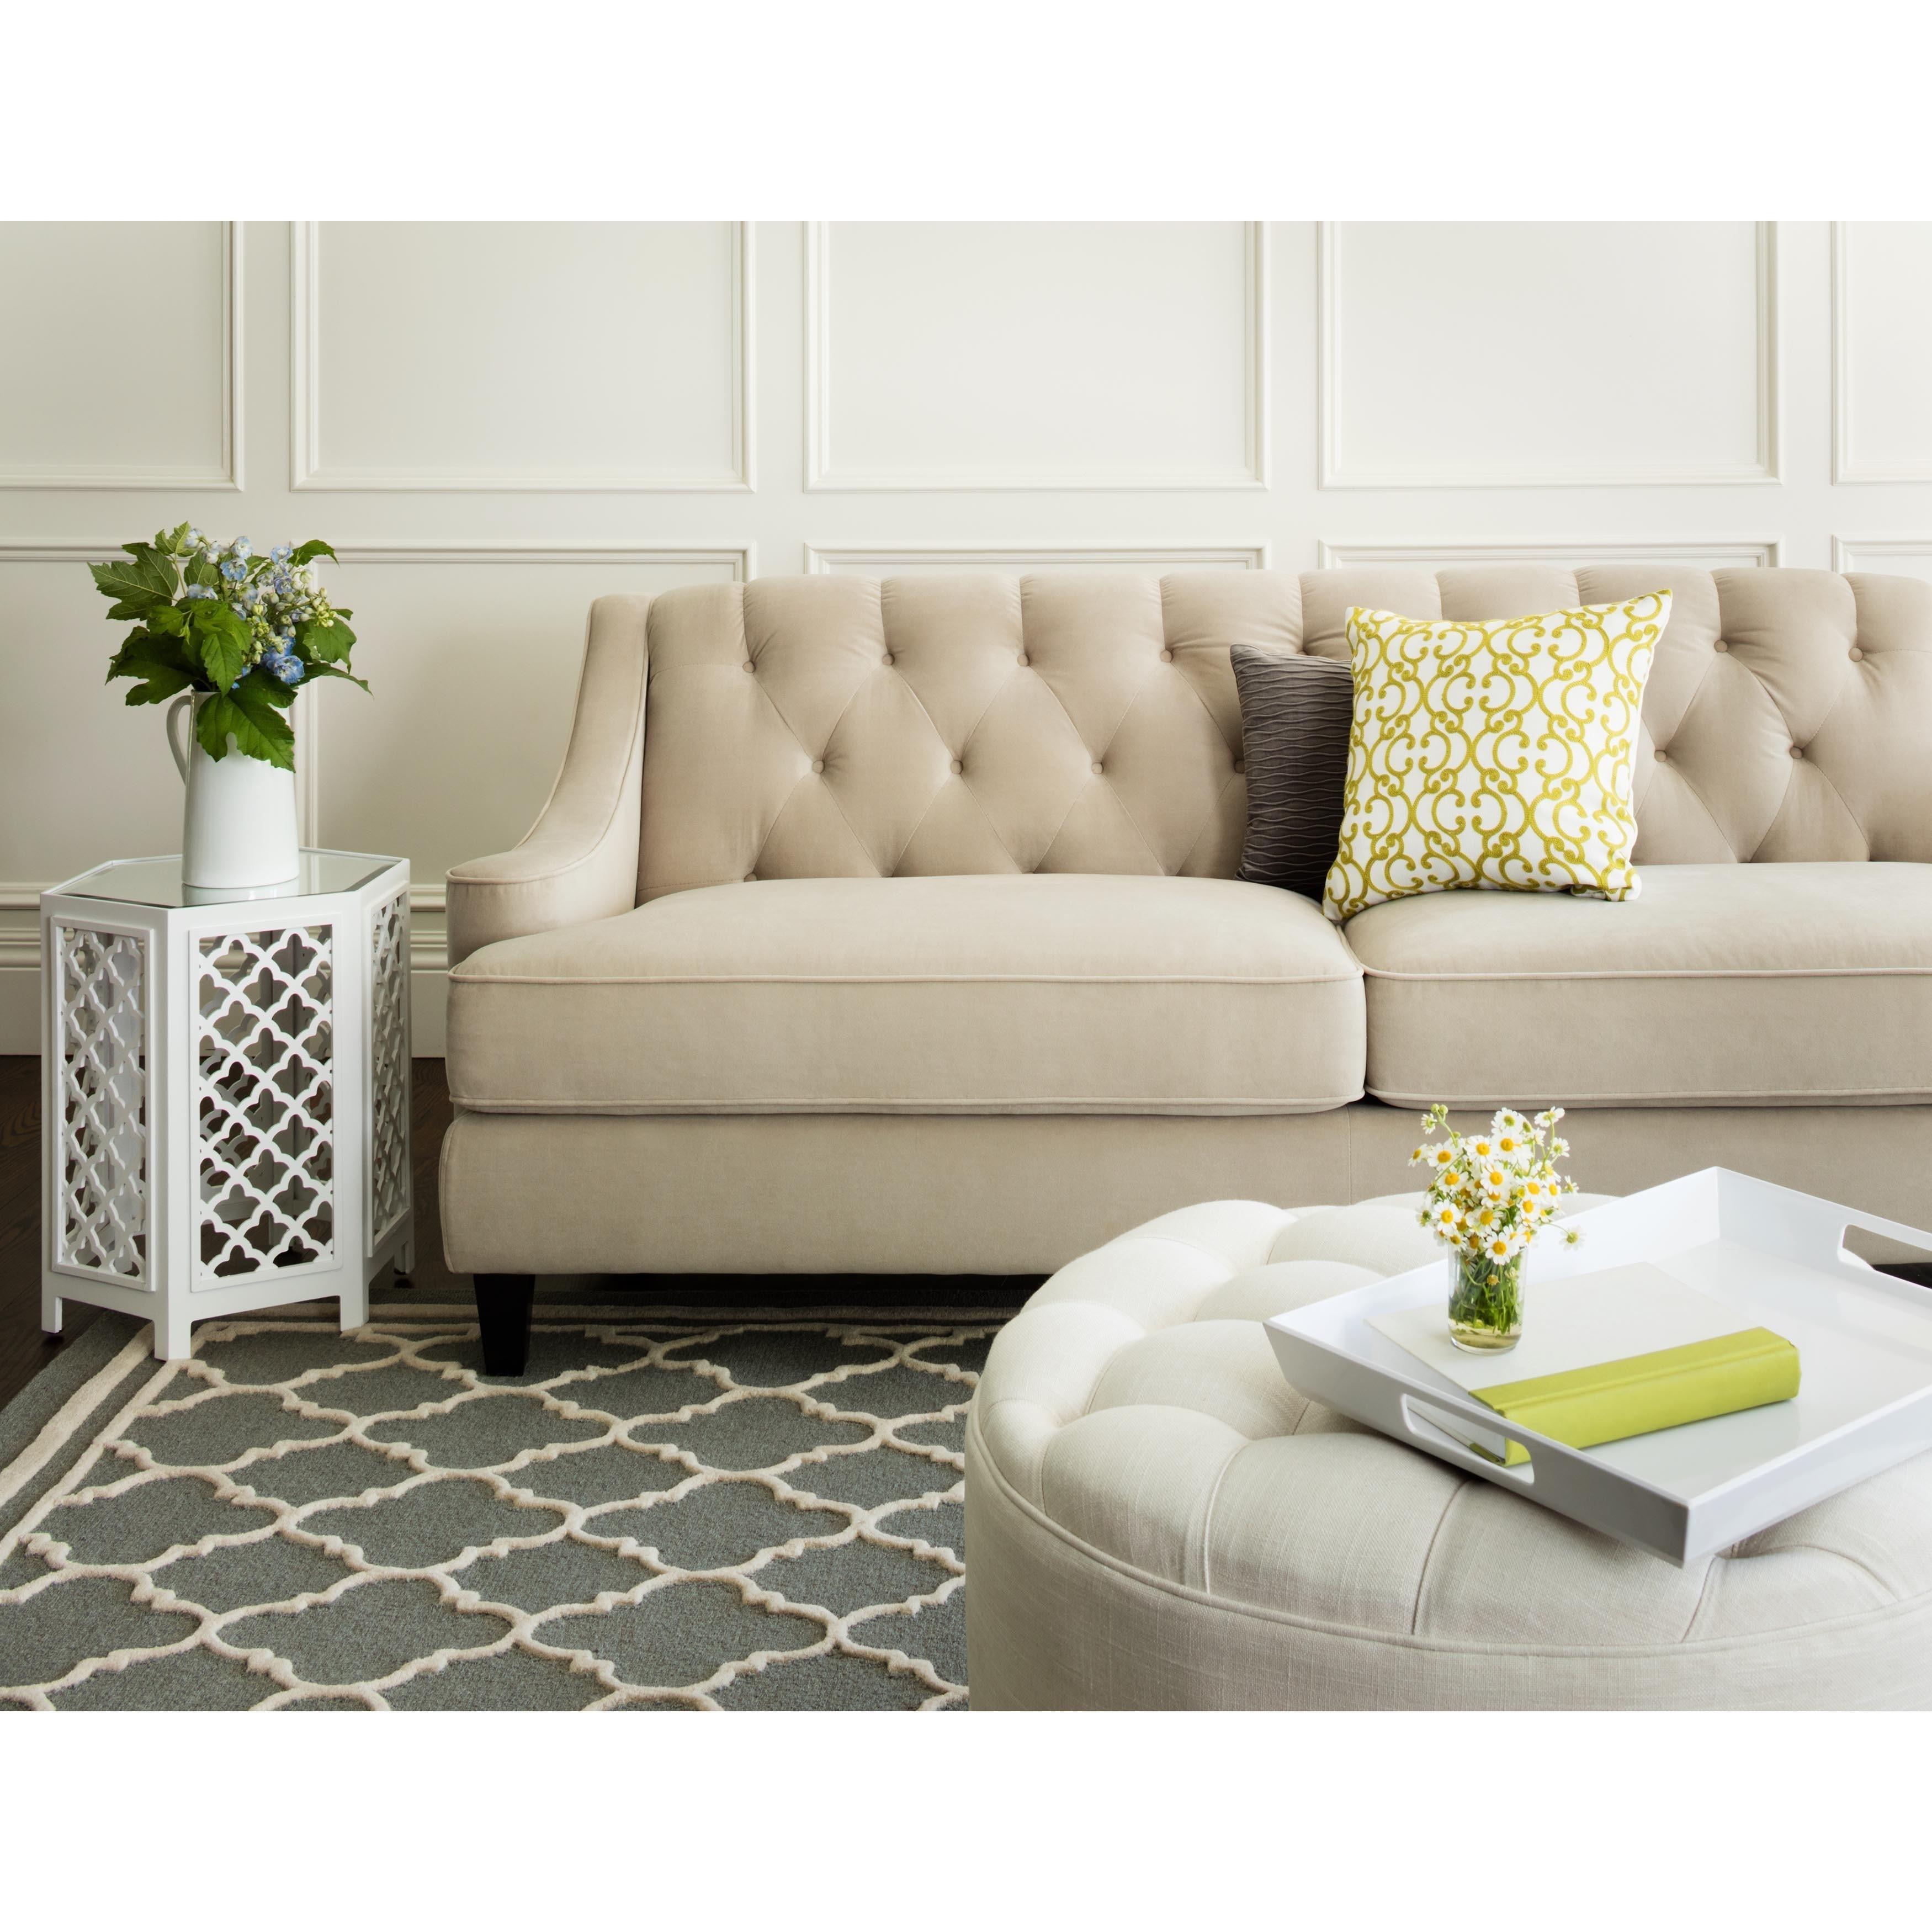 Abbyson Claridge Beige Velvet Fabric Tufted Sofa | eBay